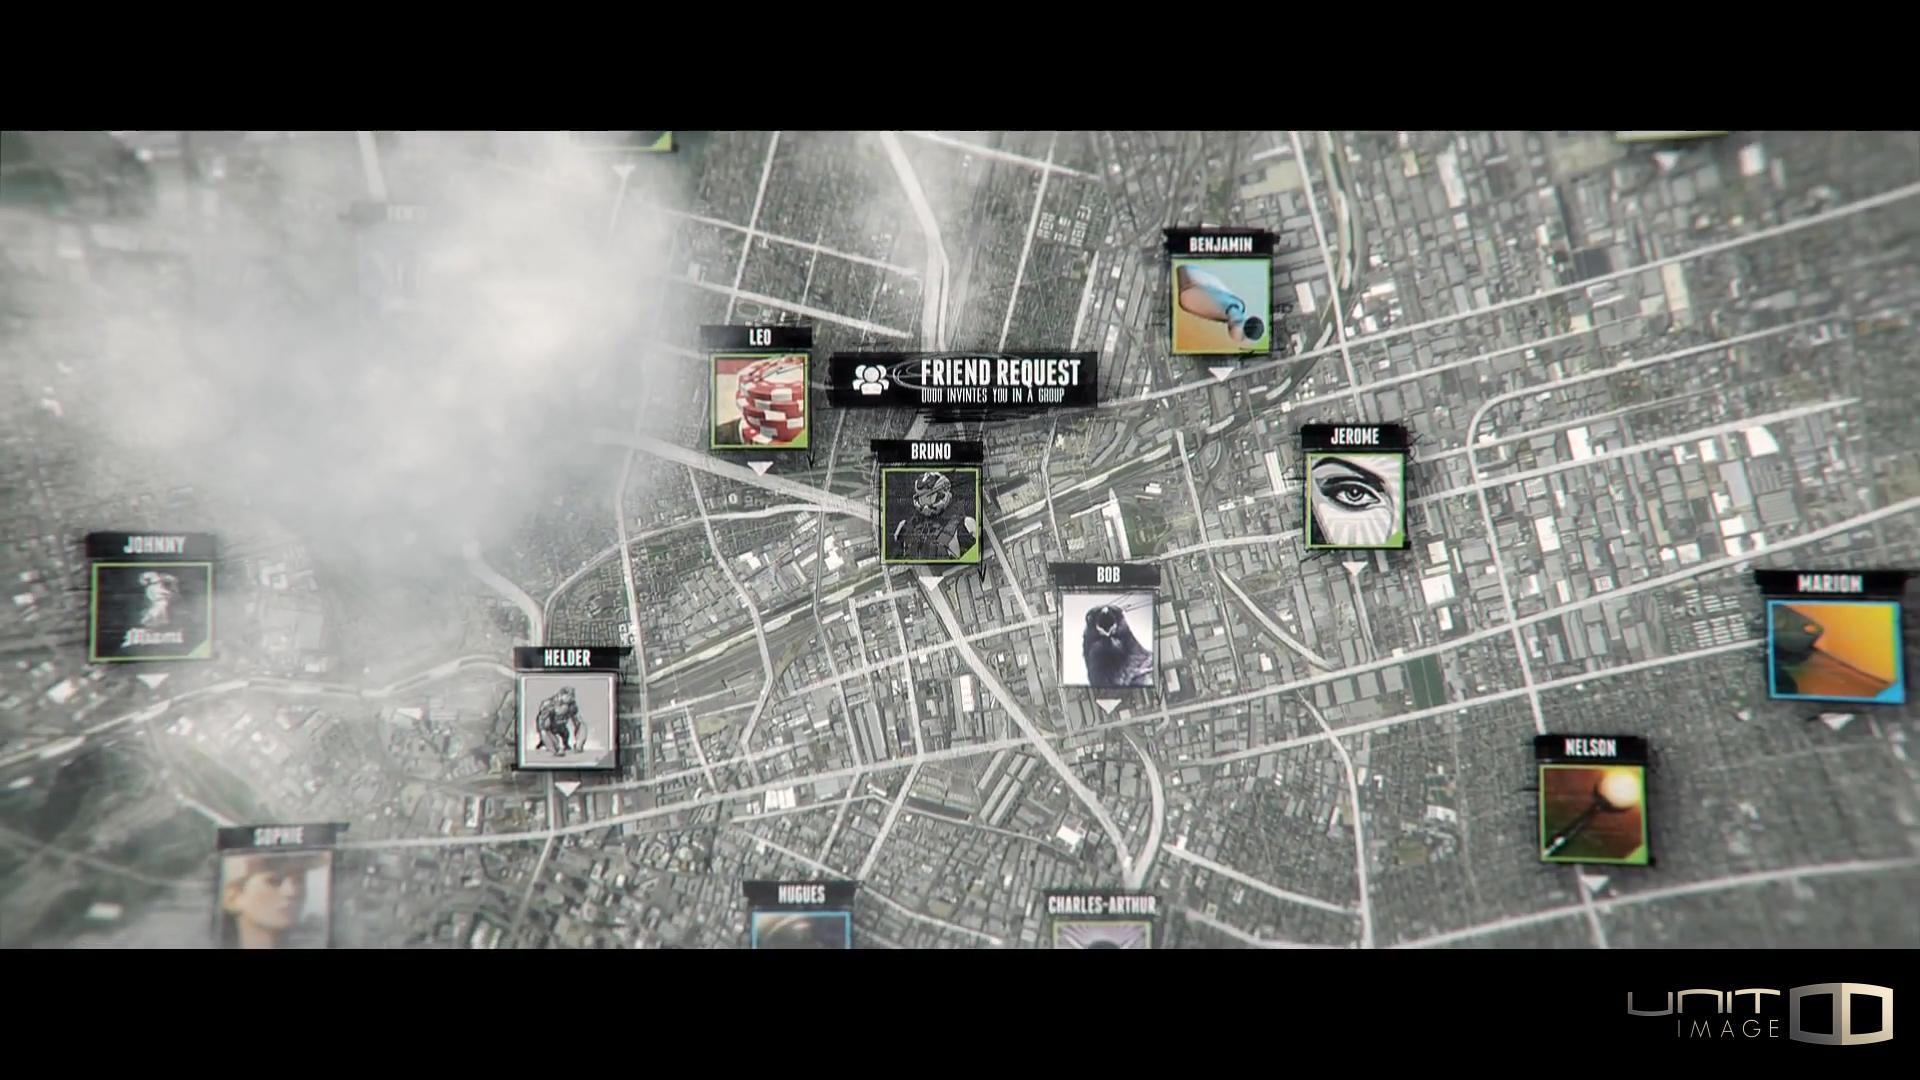 The Crew - E3 2013 - Announcement Trailer UK 04374_o.jpg